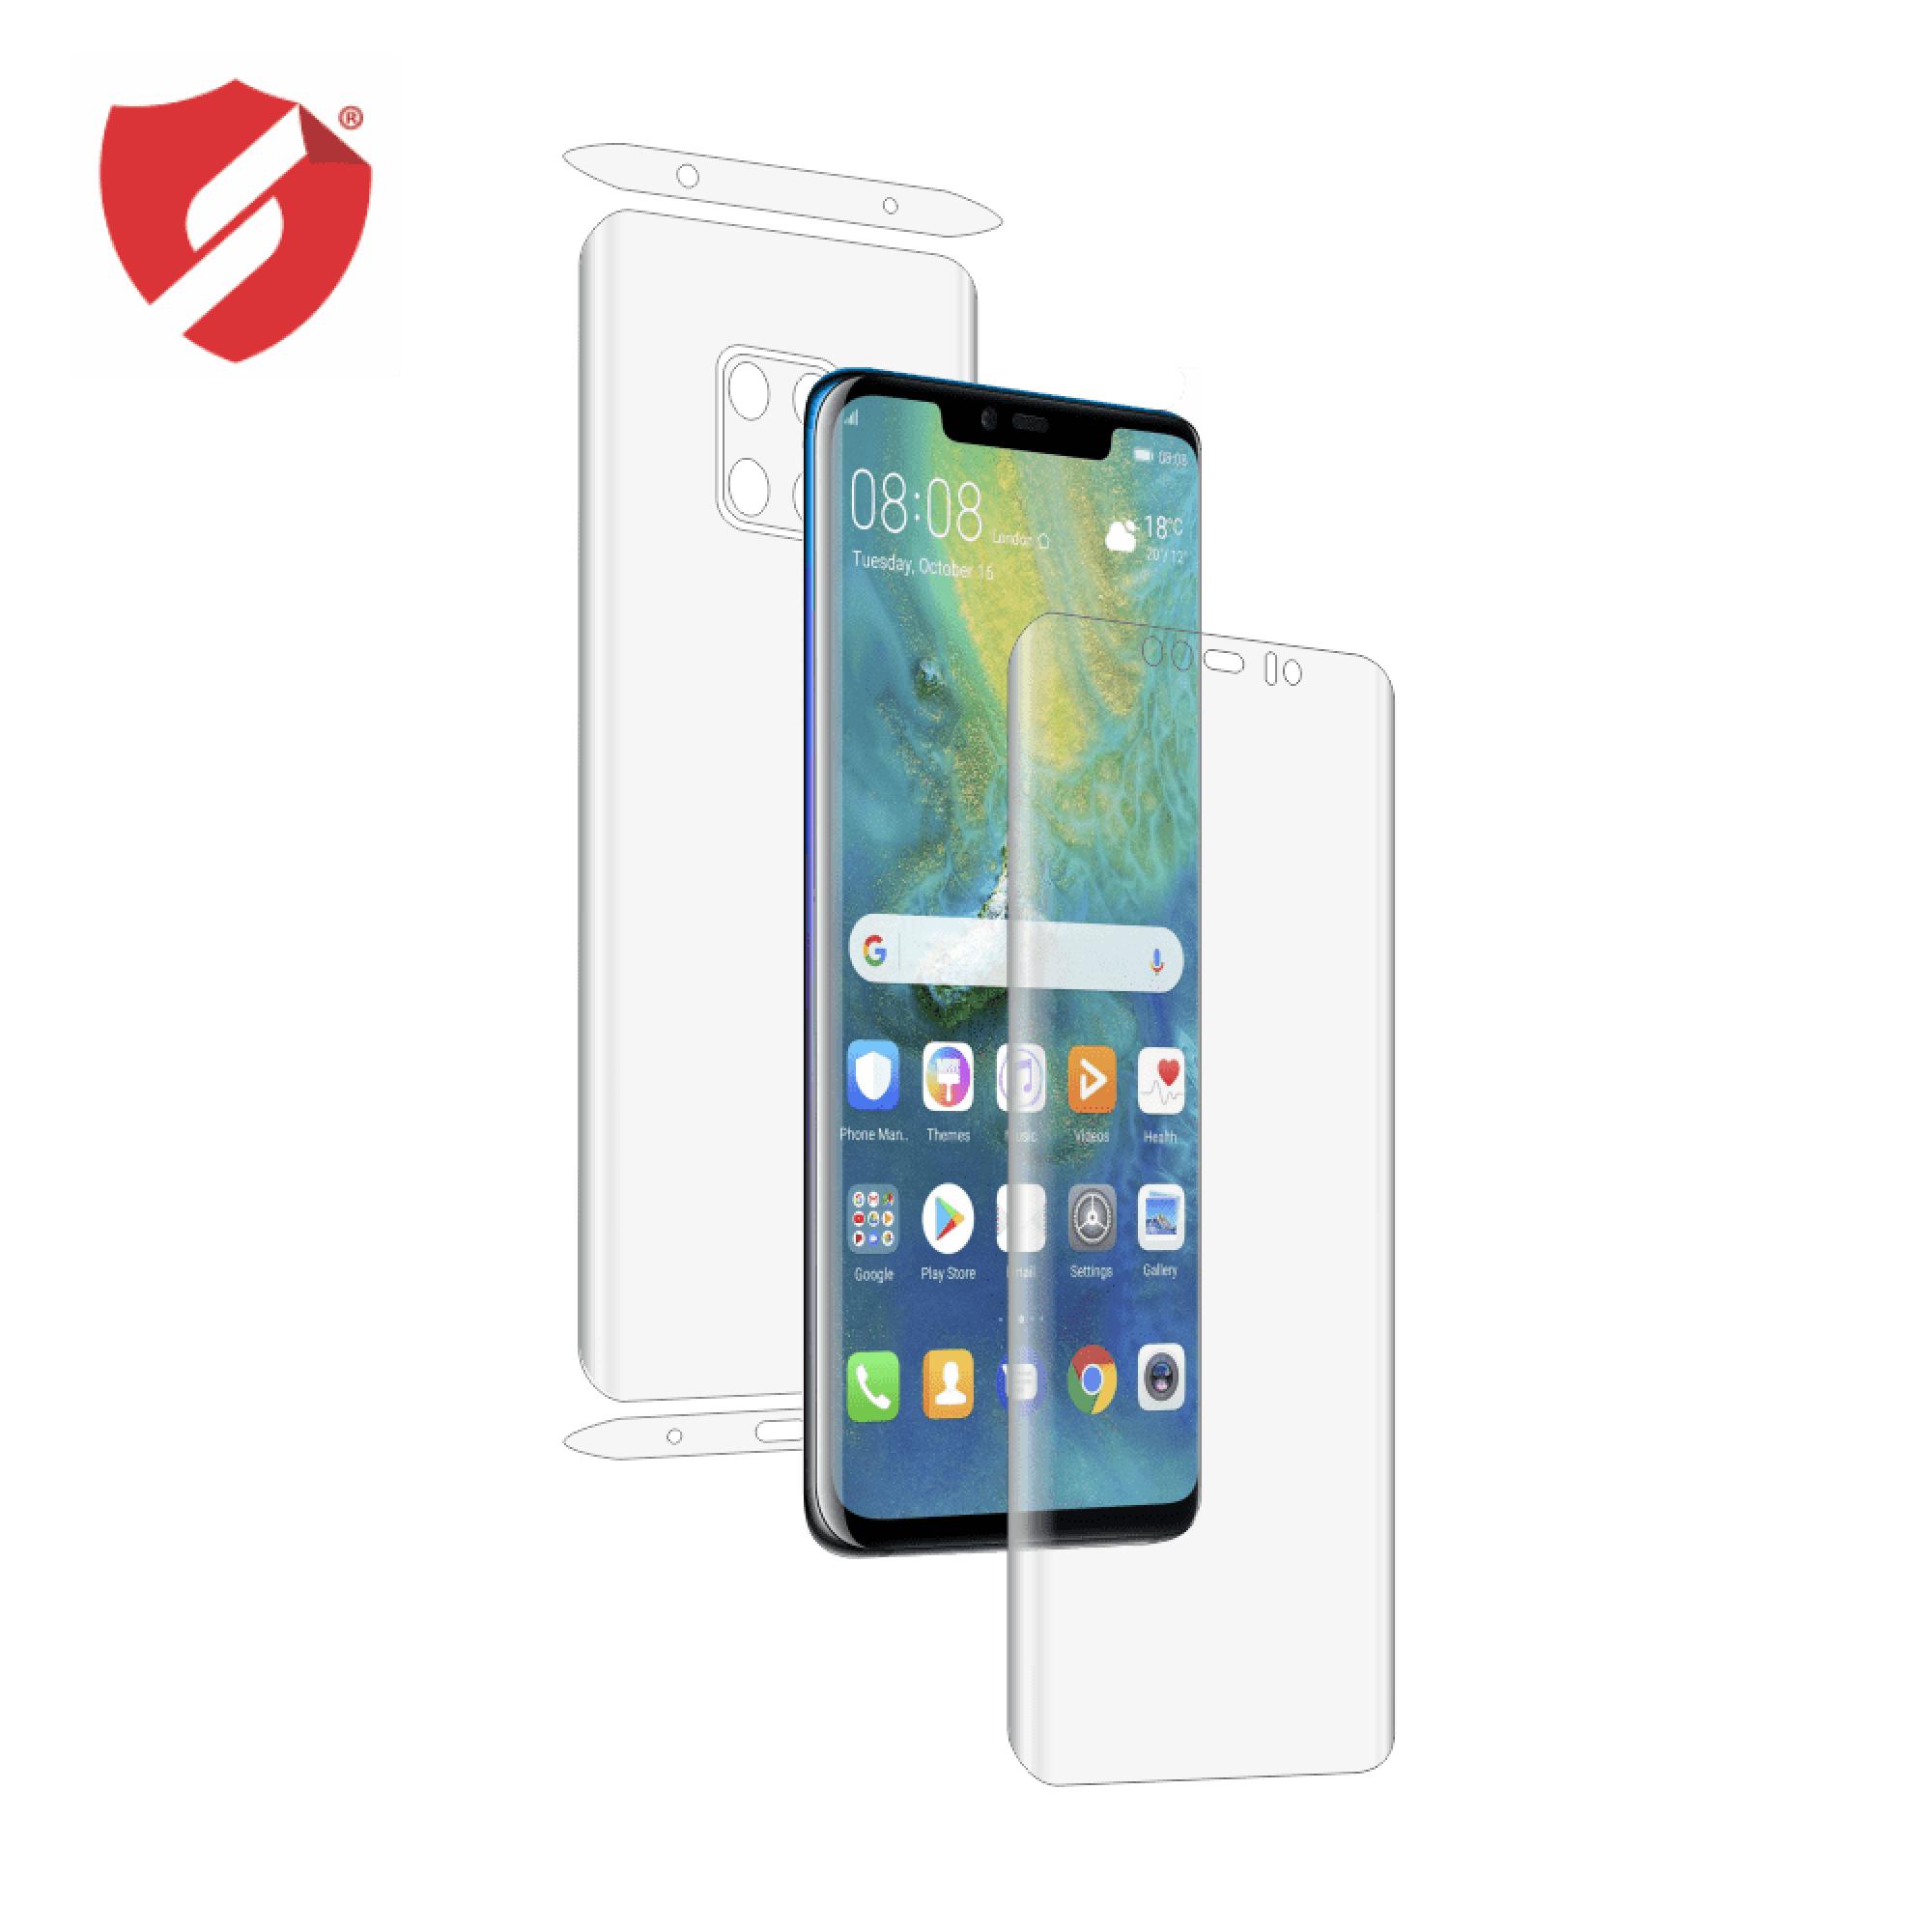 Folie de protectie Antireflex Mata Smart Protection Huawei Mate 20 Pro - fullbody - display + spate + laterale imagine